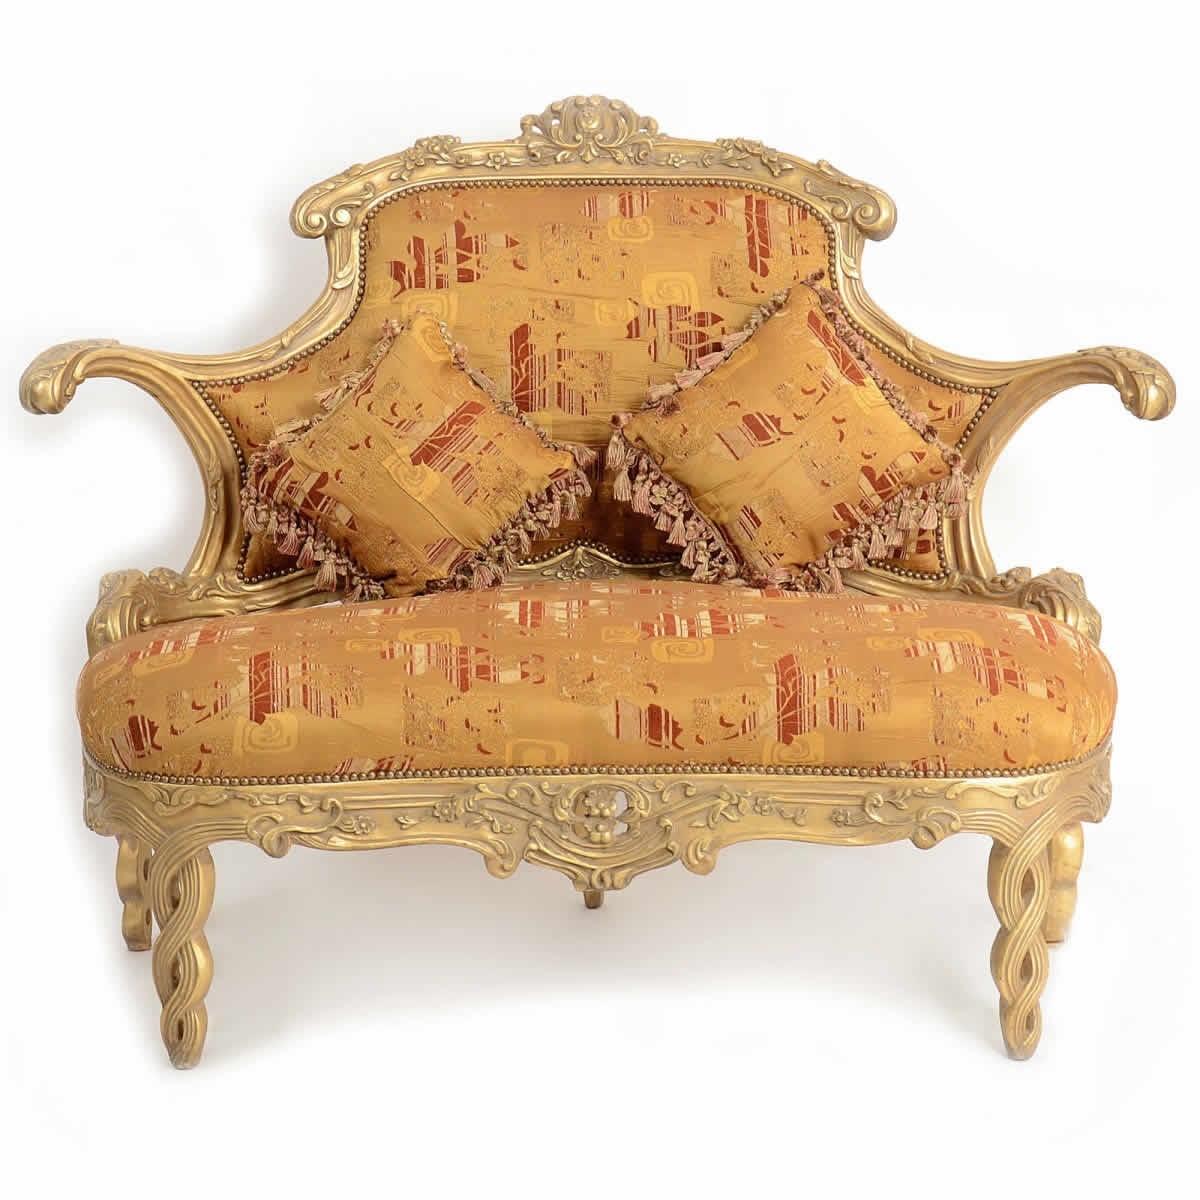 Full Size of Sofa Antik Murah Leder Optik Couch Kaufen Gebraucht Chesterfield Look Stil Ledersofa Braun Sofas Bali Barock Rokkoko Louis Xv Xvi Klassische Halbrundes Xxxl Sofa Sofa Antik